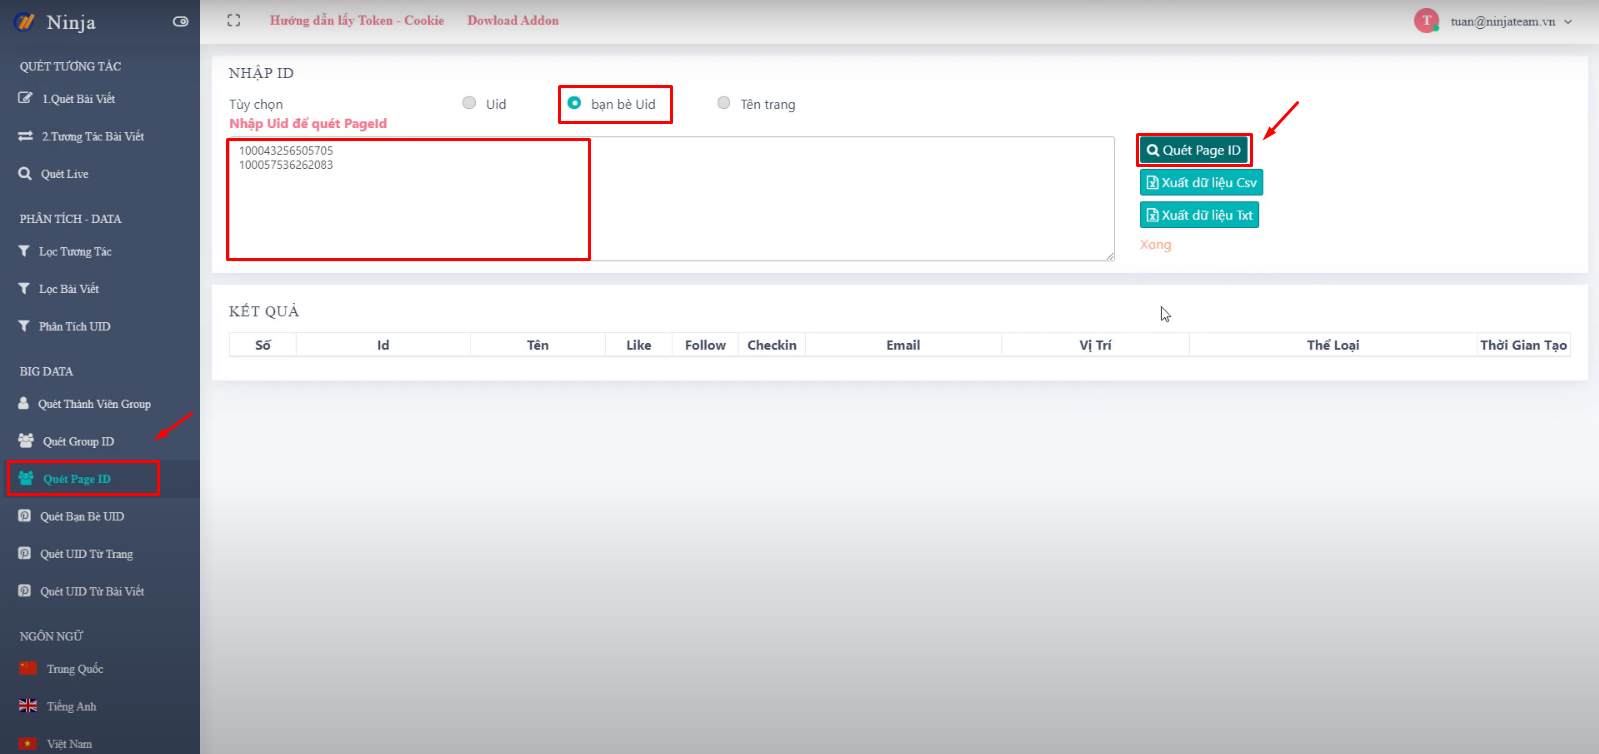 cach tim kiem fanpage facebook5 Cách tìm kiếm data fanpage trên phần mềm Ninja UID Pro